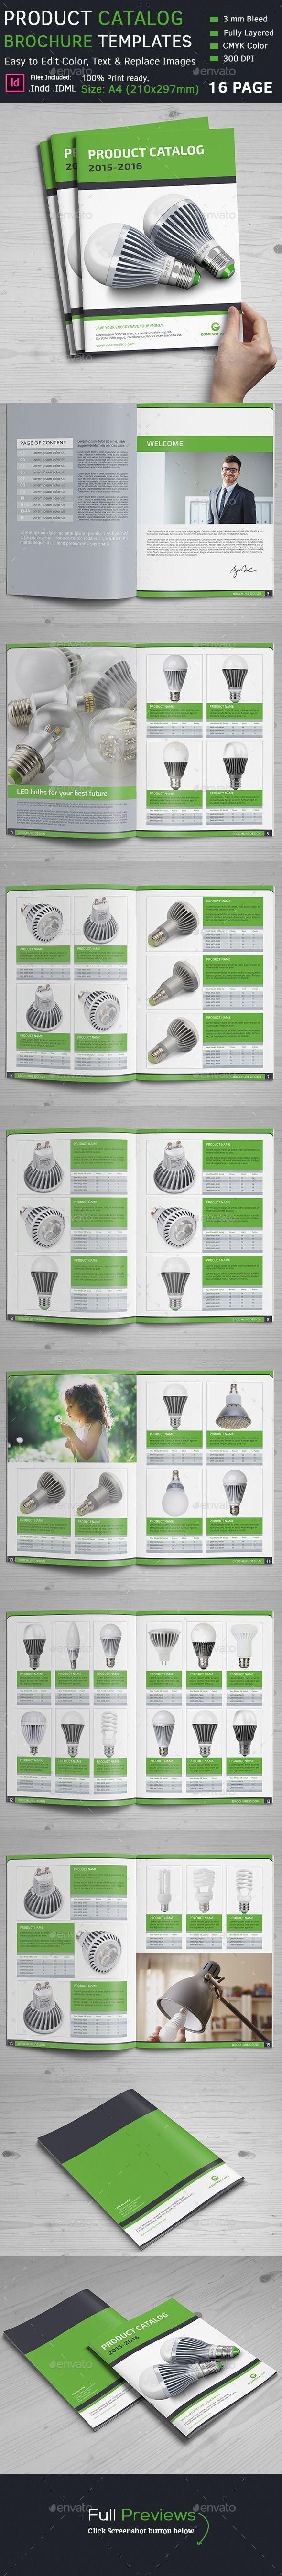 Product Catalog Tempalte #design Download: http://graphicriver.net/item/product-catalog/11630273?ref=ksioks